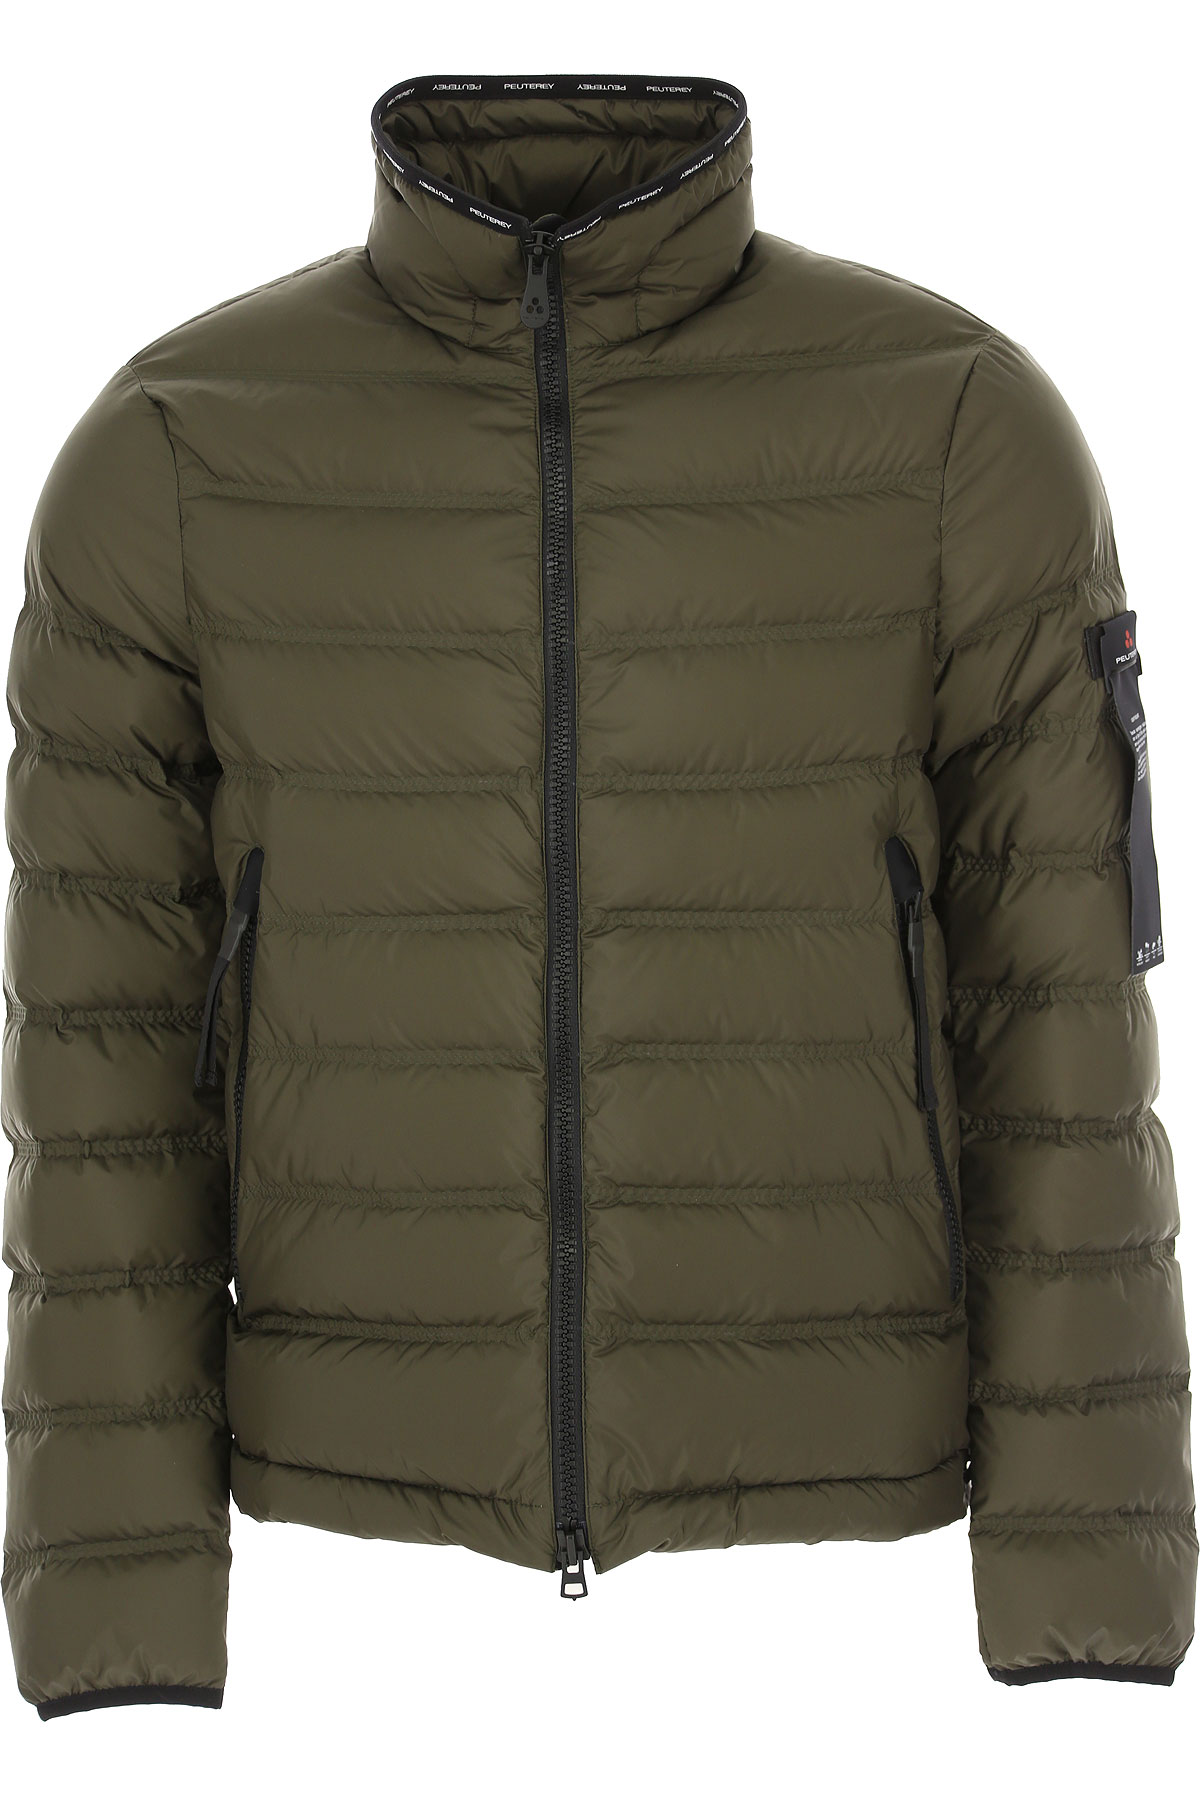 Peuterey Down Jacket for Men, Puffer Ski Jacket On Sale, Mud, polyamide, 2019, 6 8